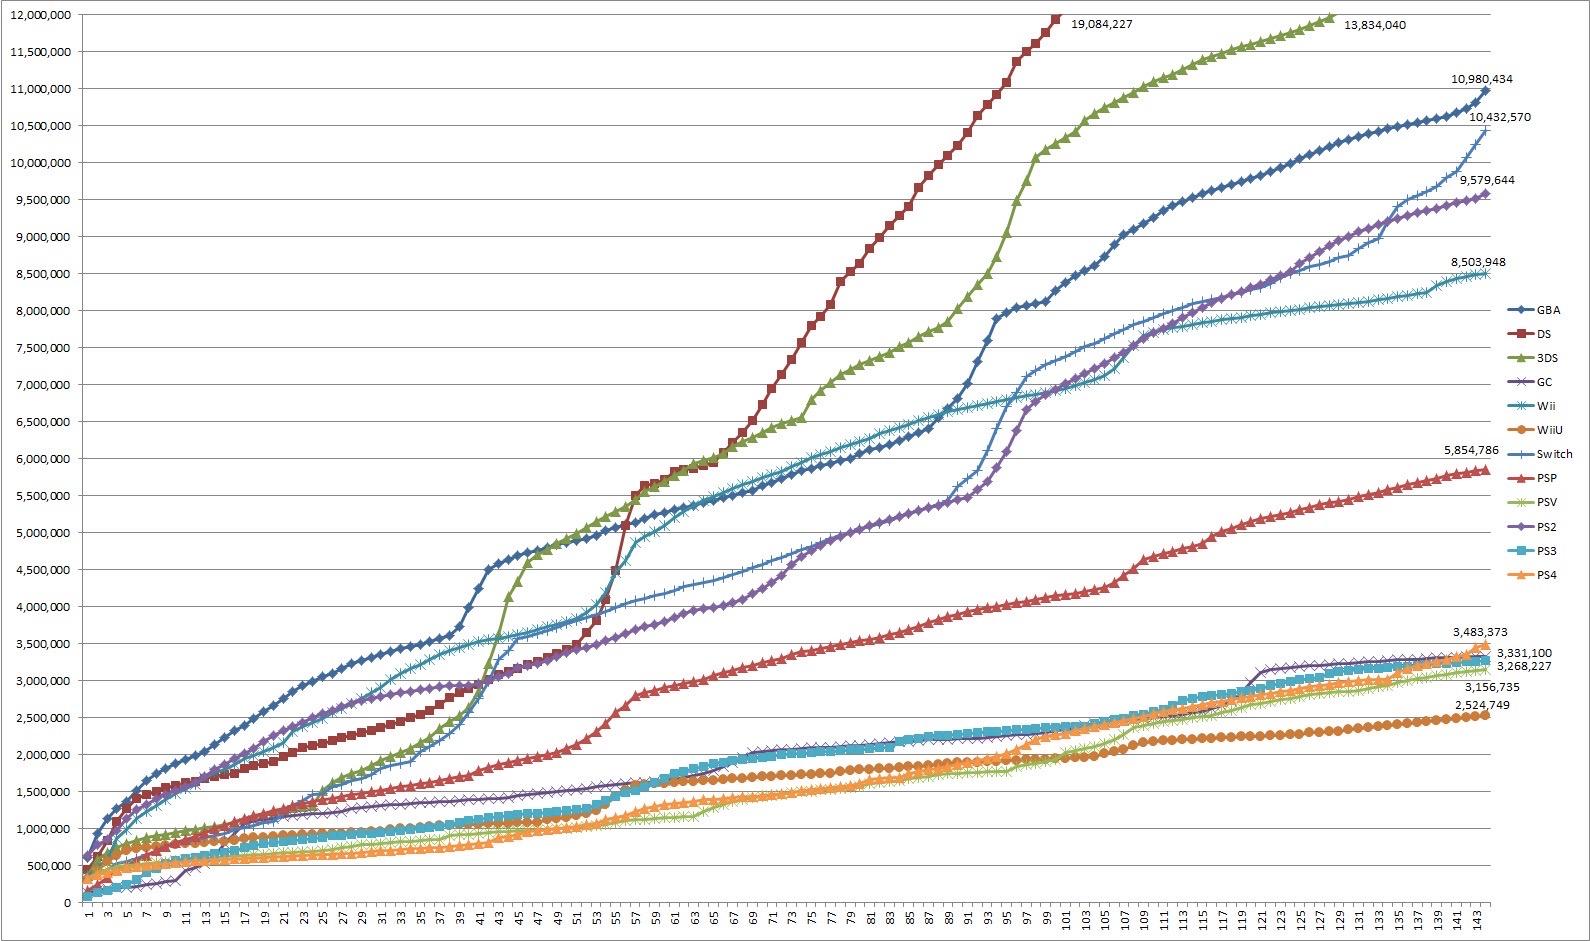 dorY8Do - 3年目国内スイッチ、12月で140万売らなければ、3年目国内3DSに敗れる模様